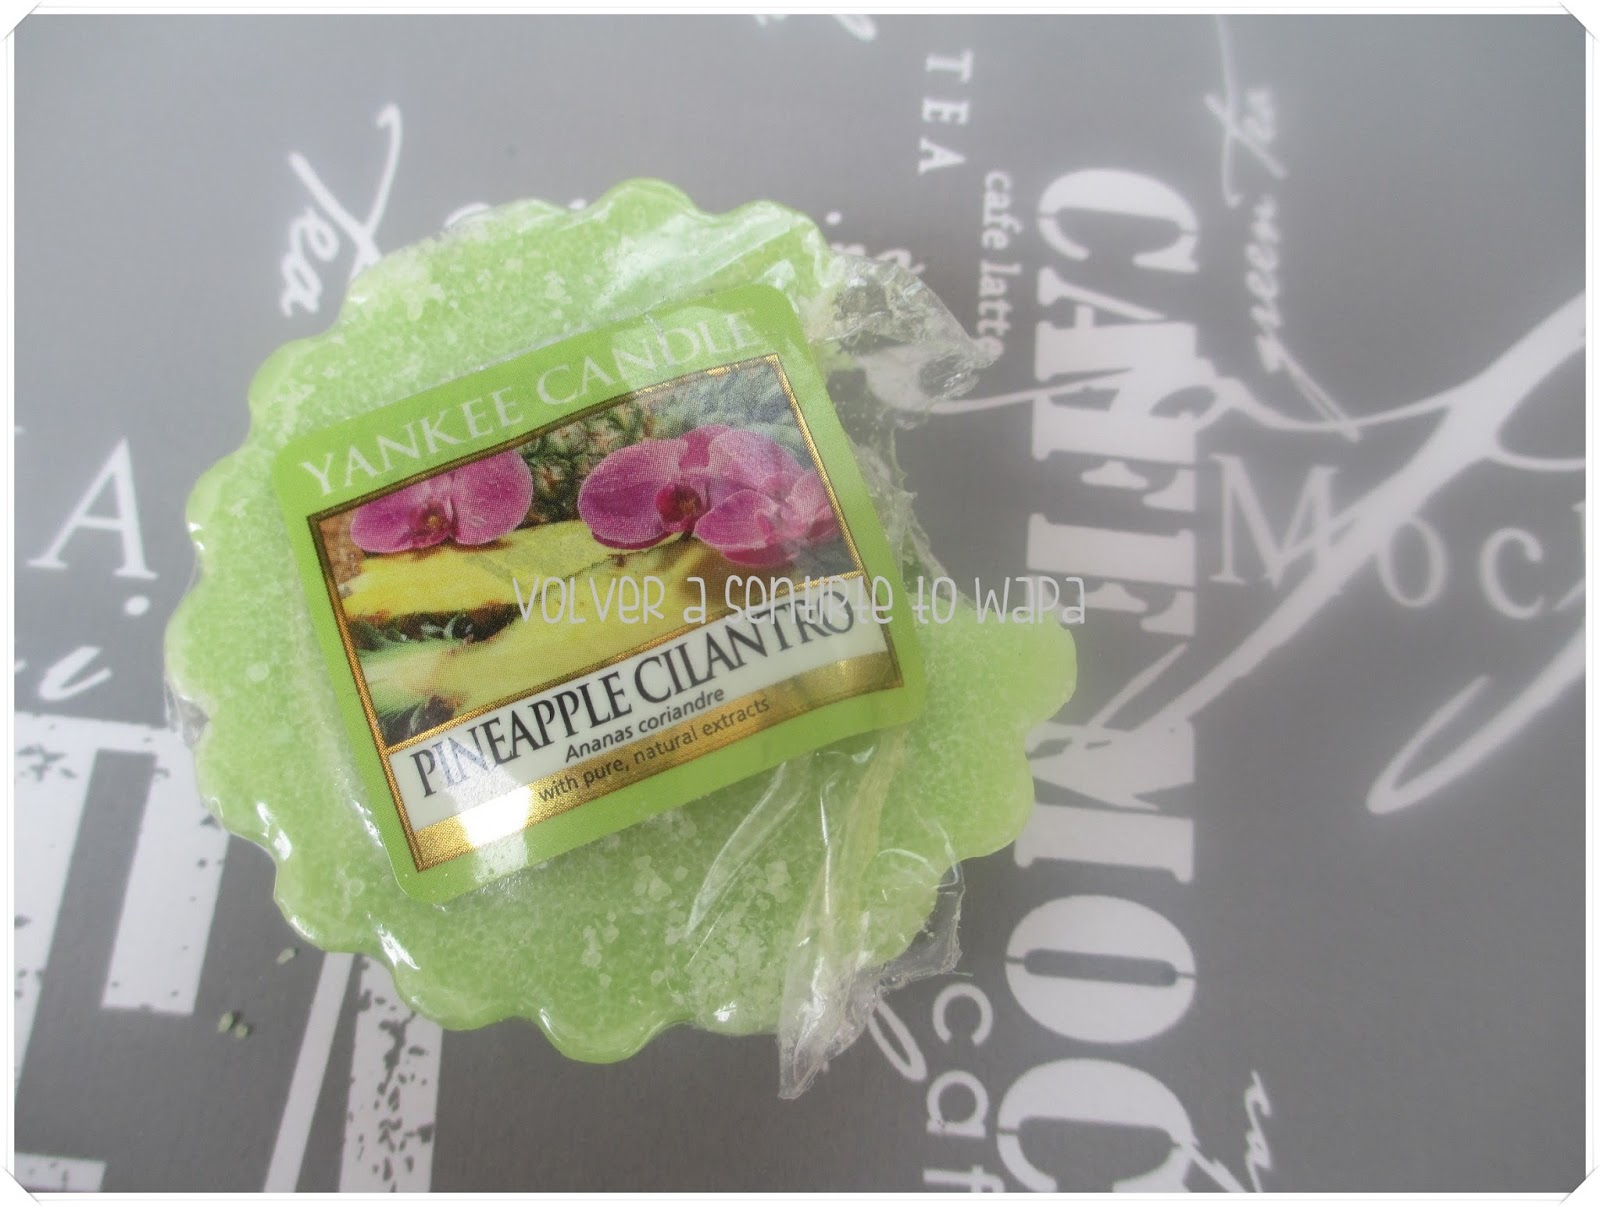 Tart Yankee Candle de piña y cilantro